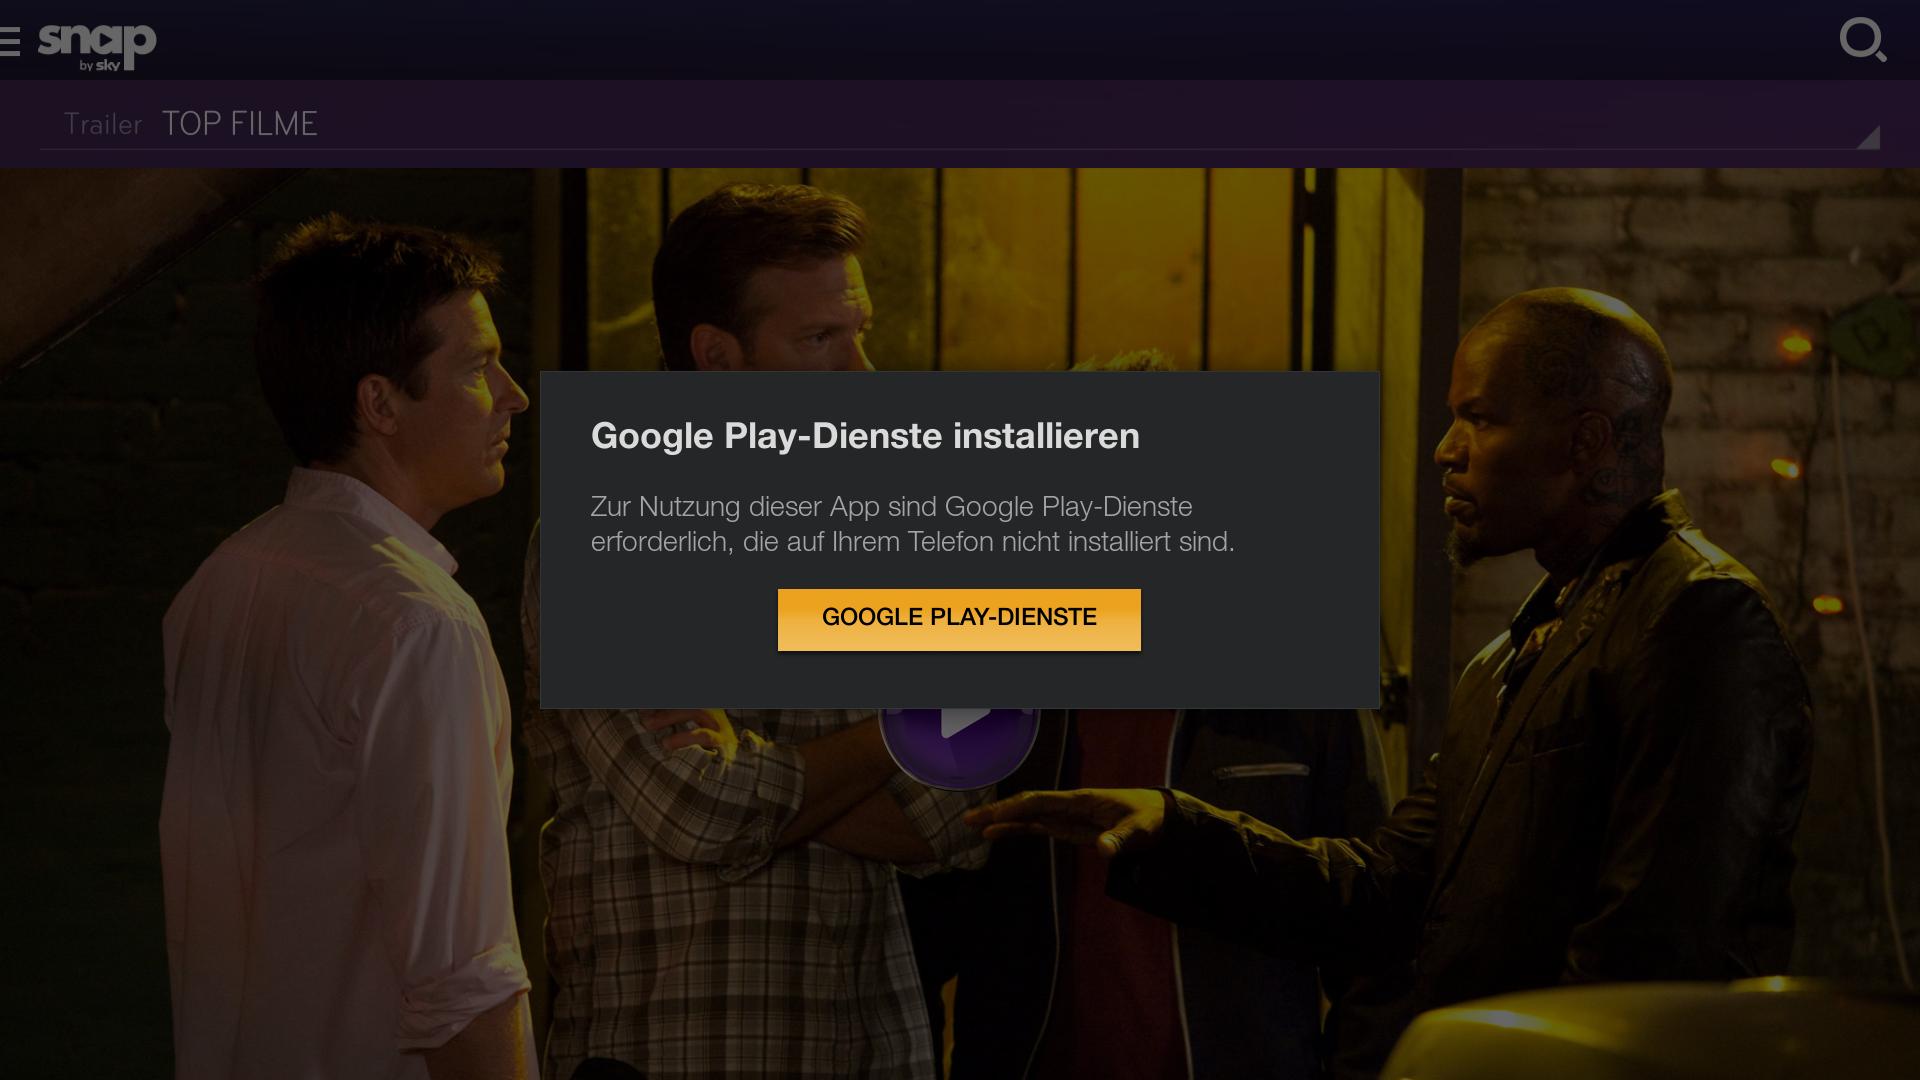 google play installiert nicht